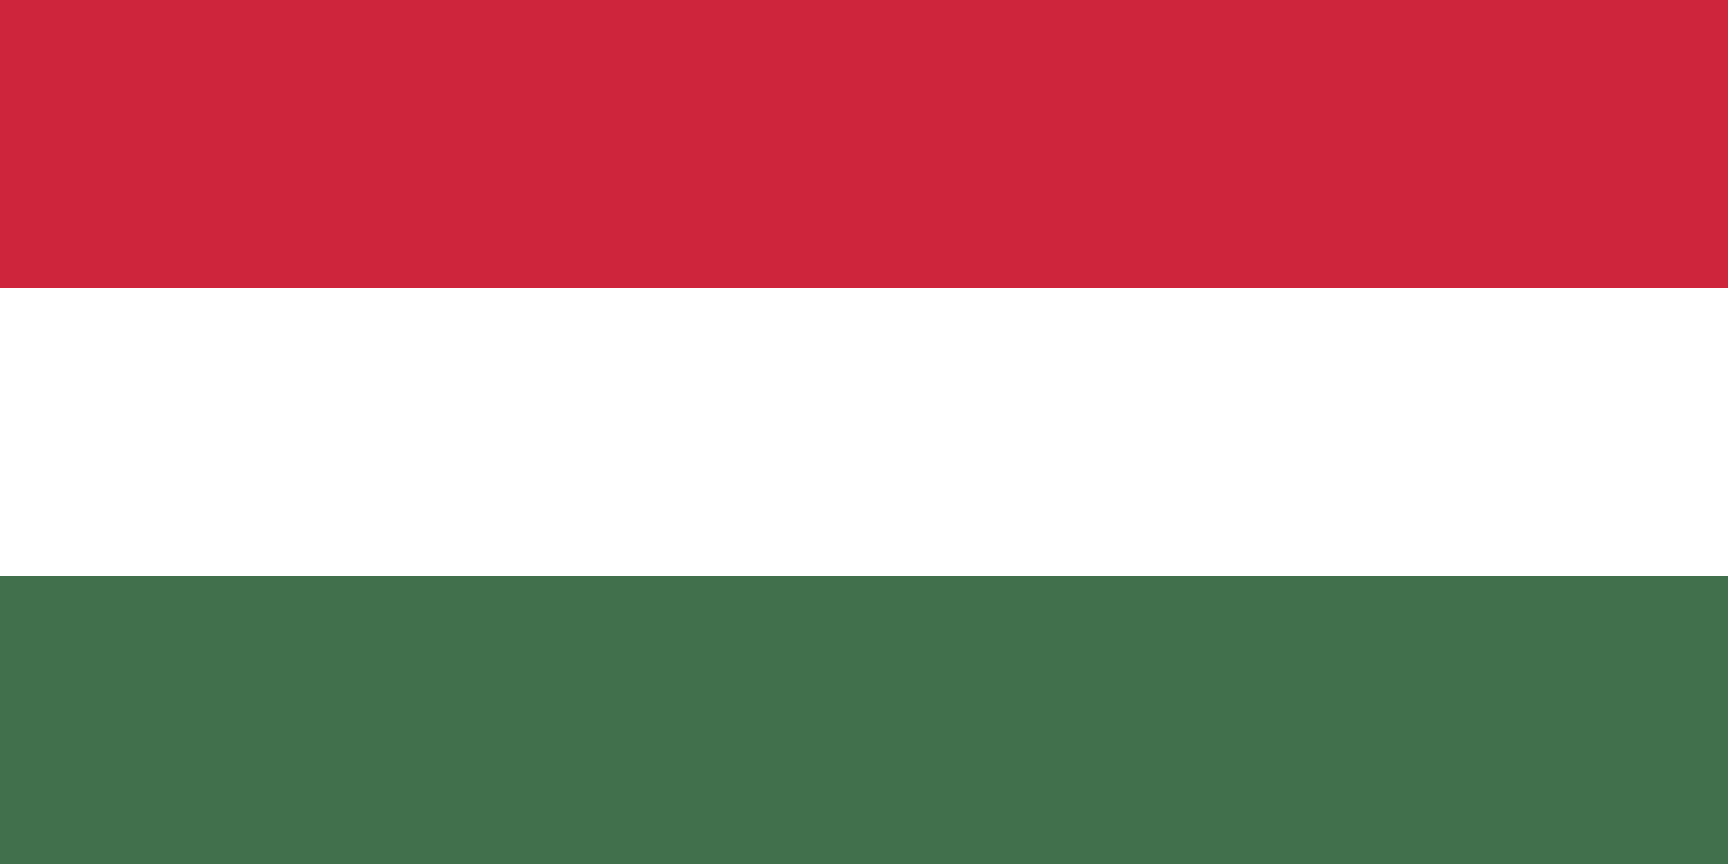 Flagge im Querformat Land Ungarn 150x100 cm